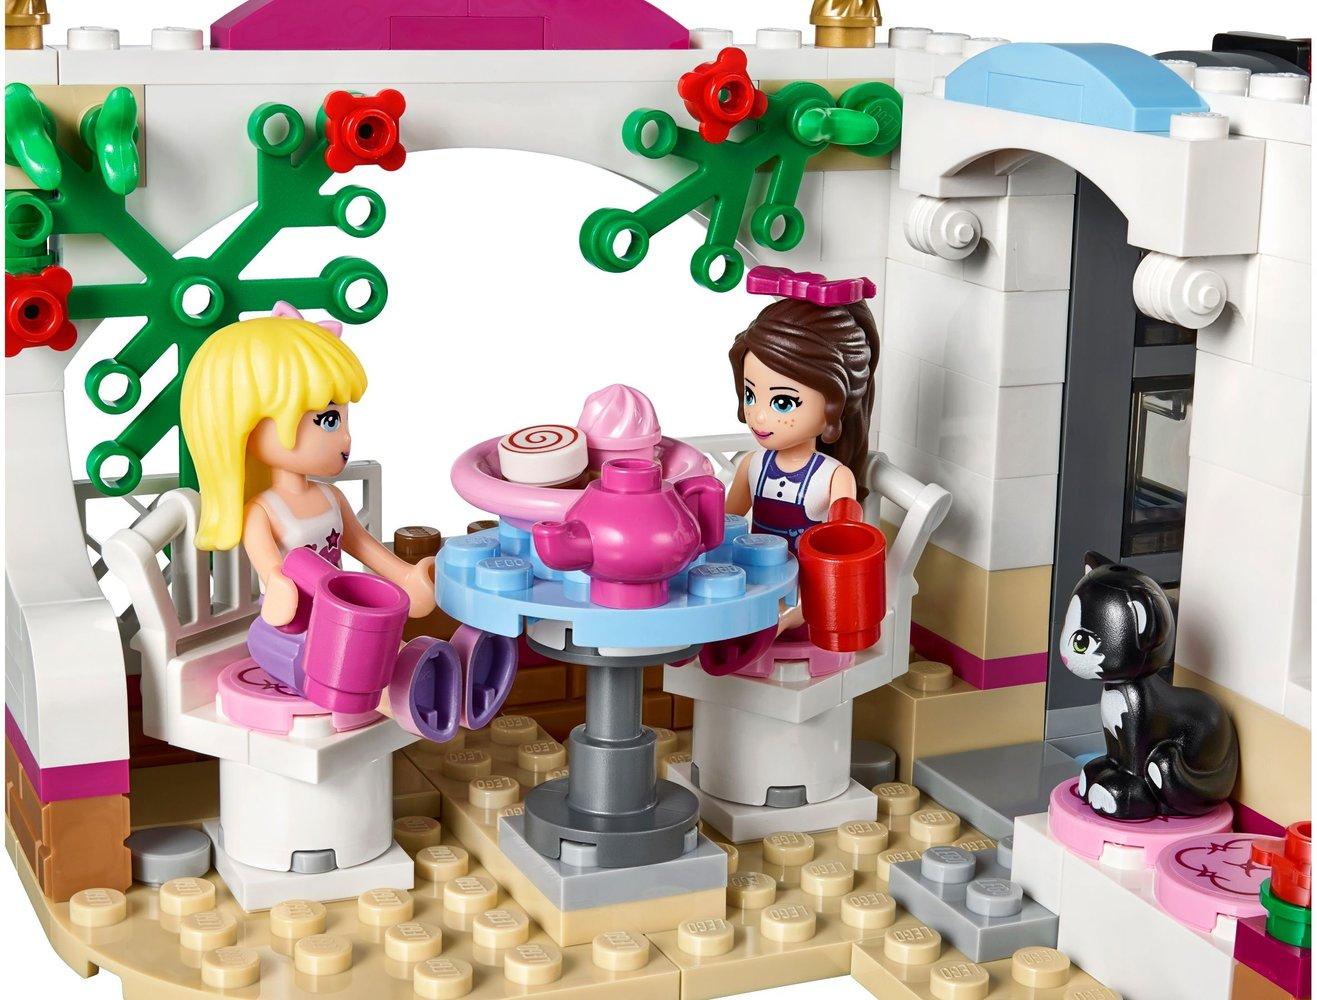 Lego Friends 41119 pas cher, Le cupcake café d'Heartlake City